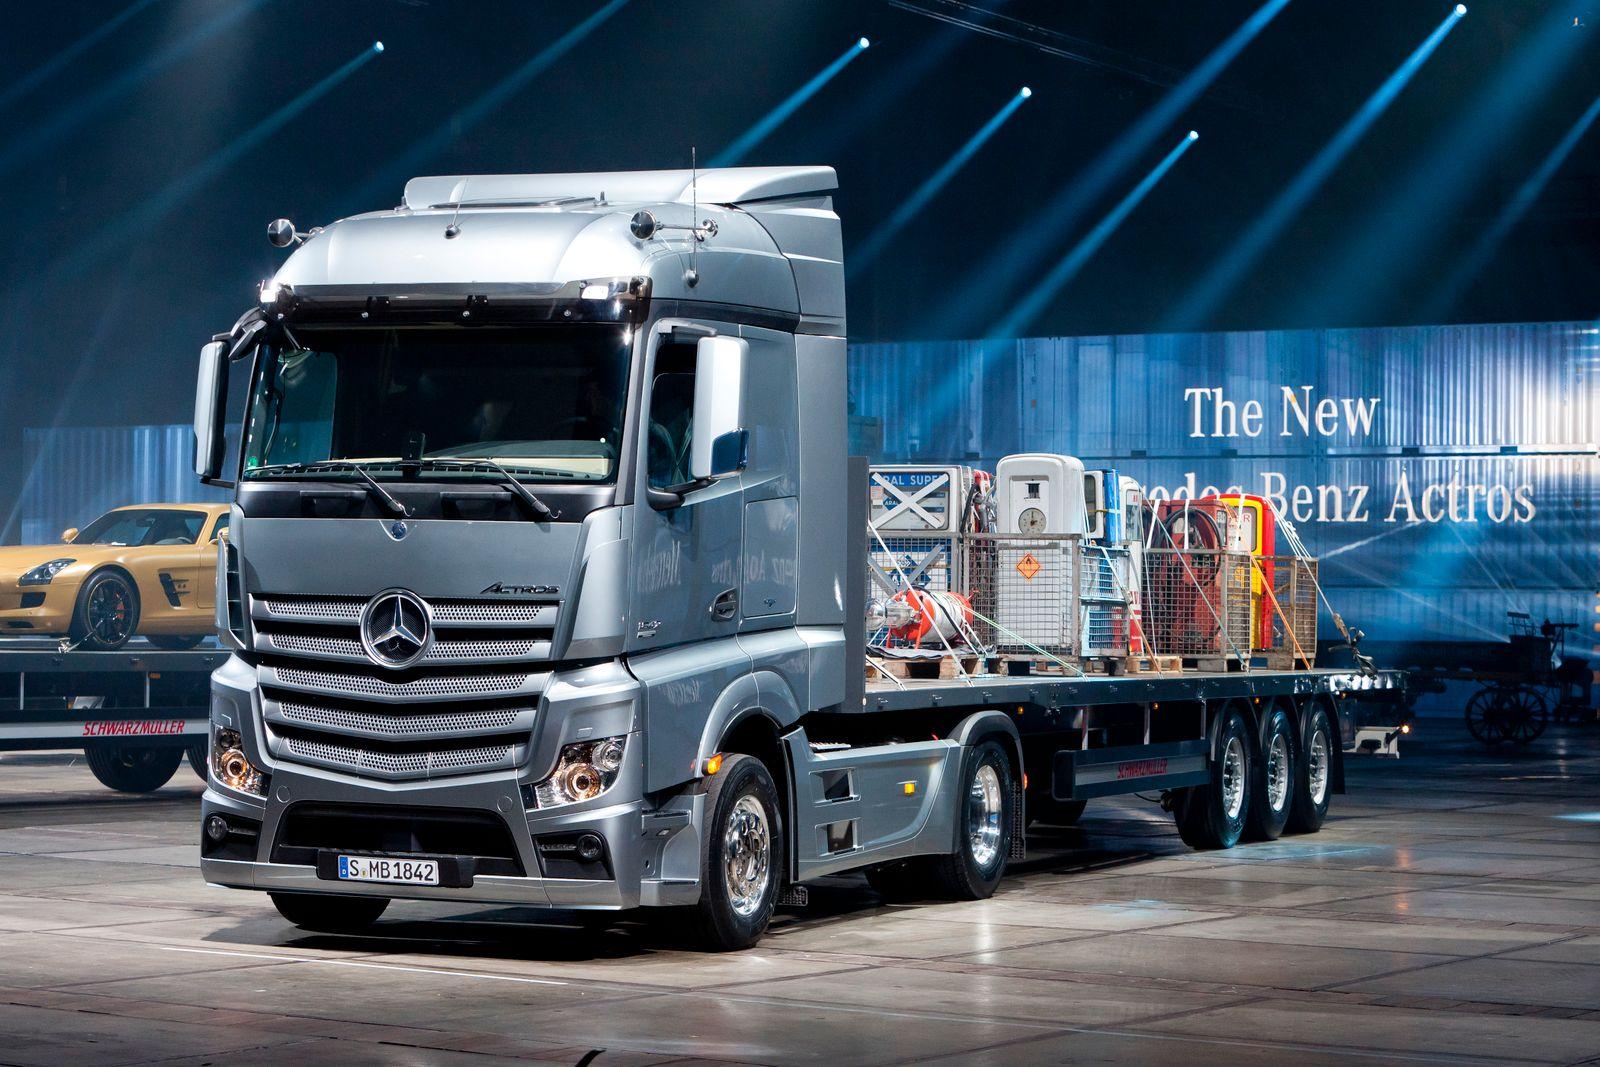 Daimler Mercedes Truck / LKW New Actros